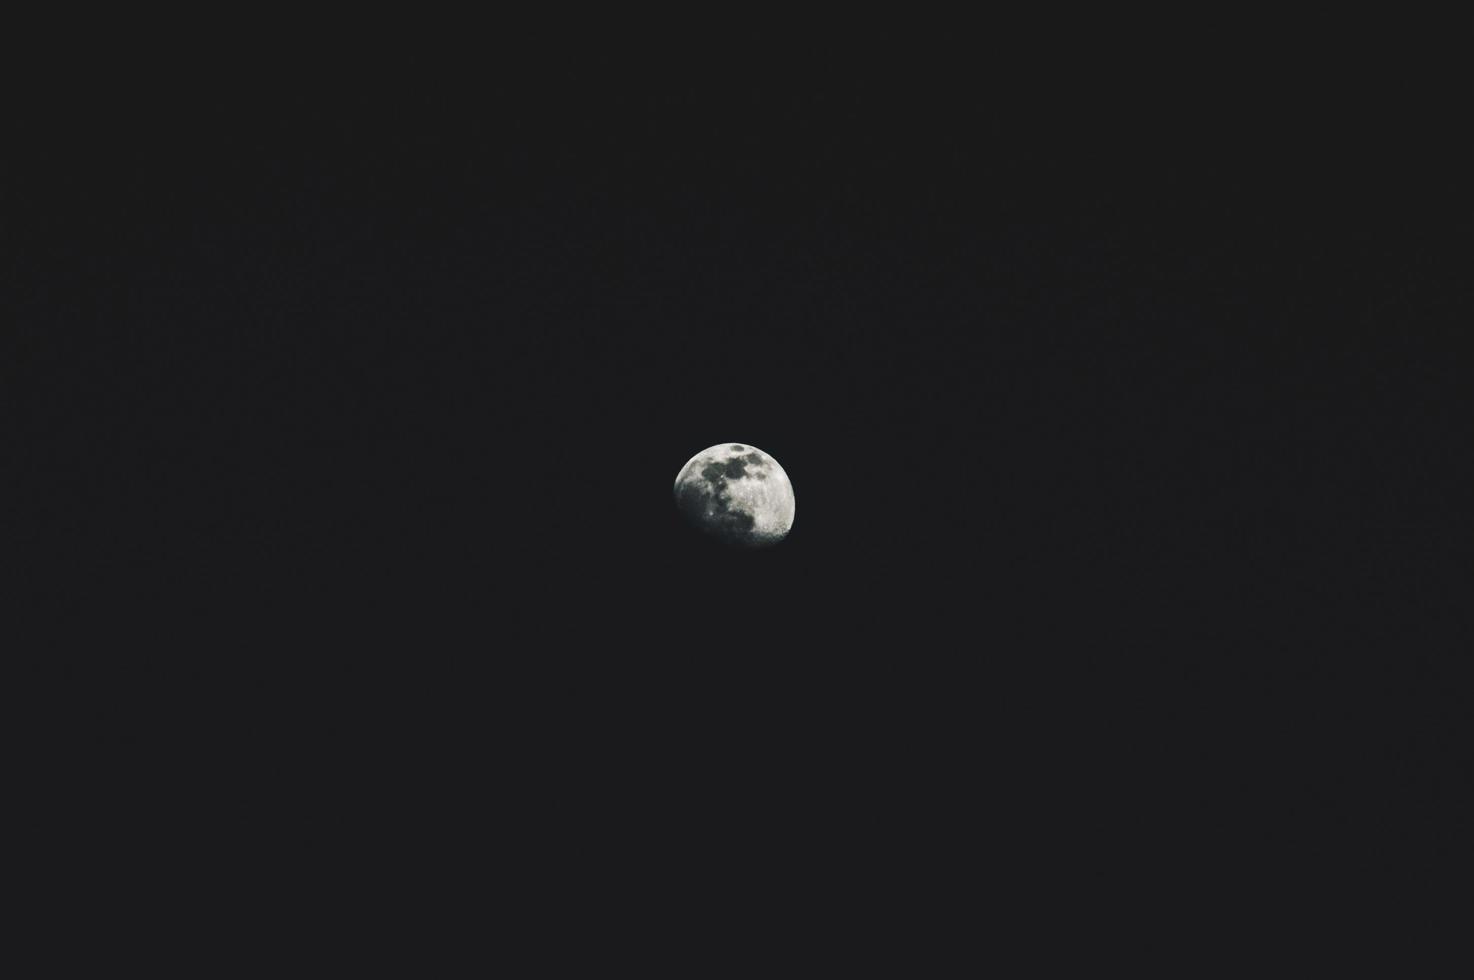 Gray moon closeup in the dark sky photo